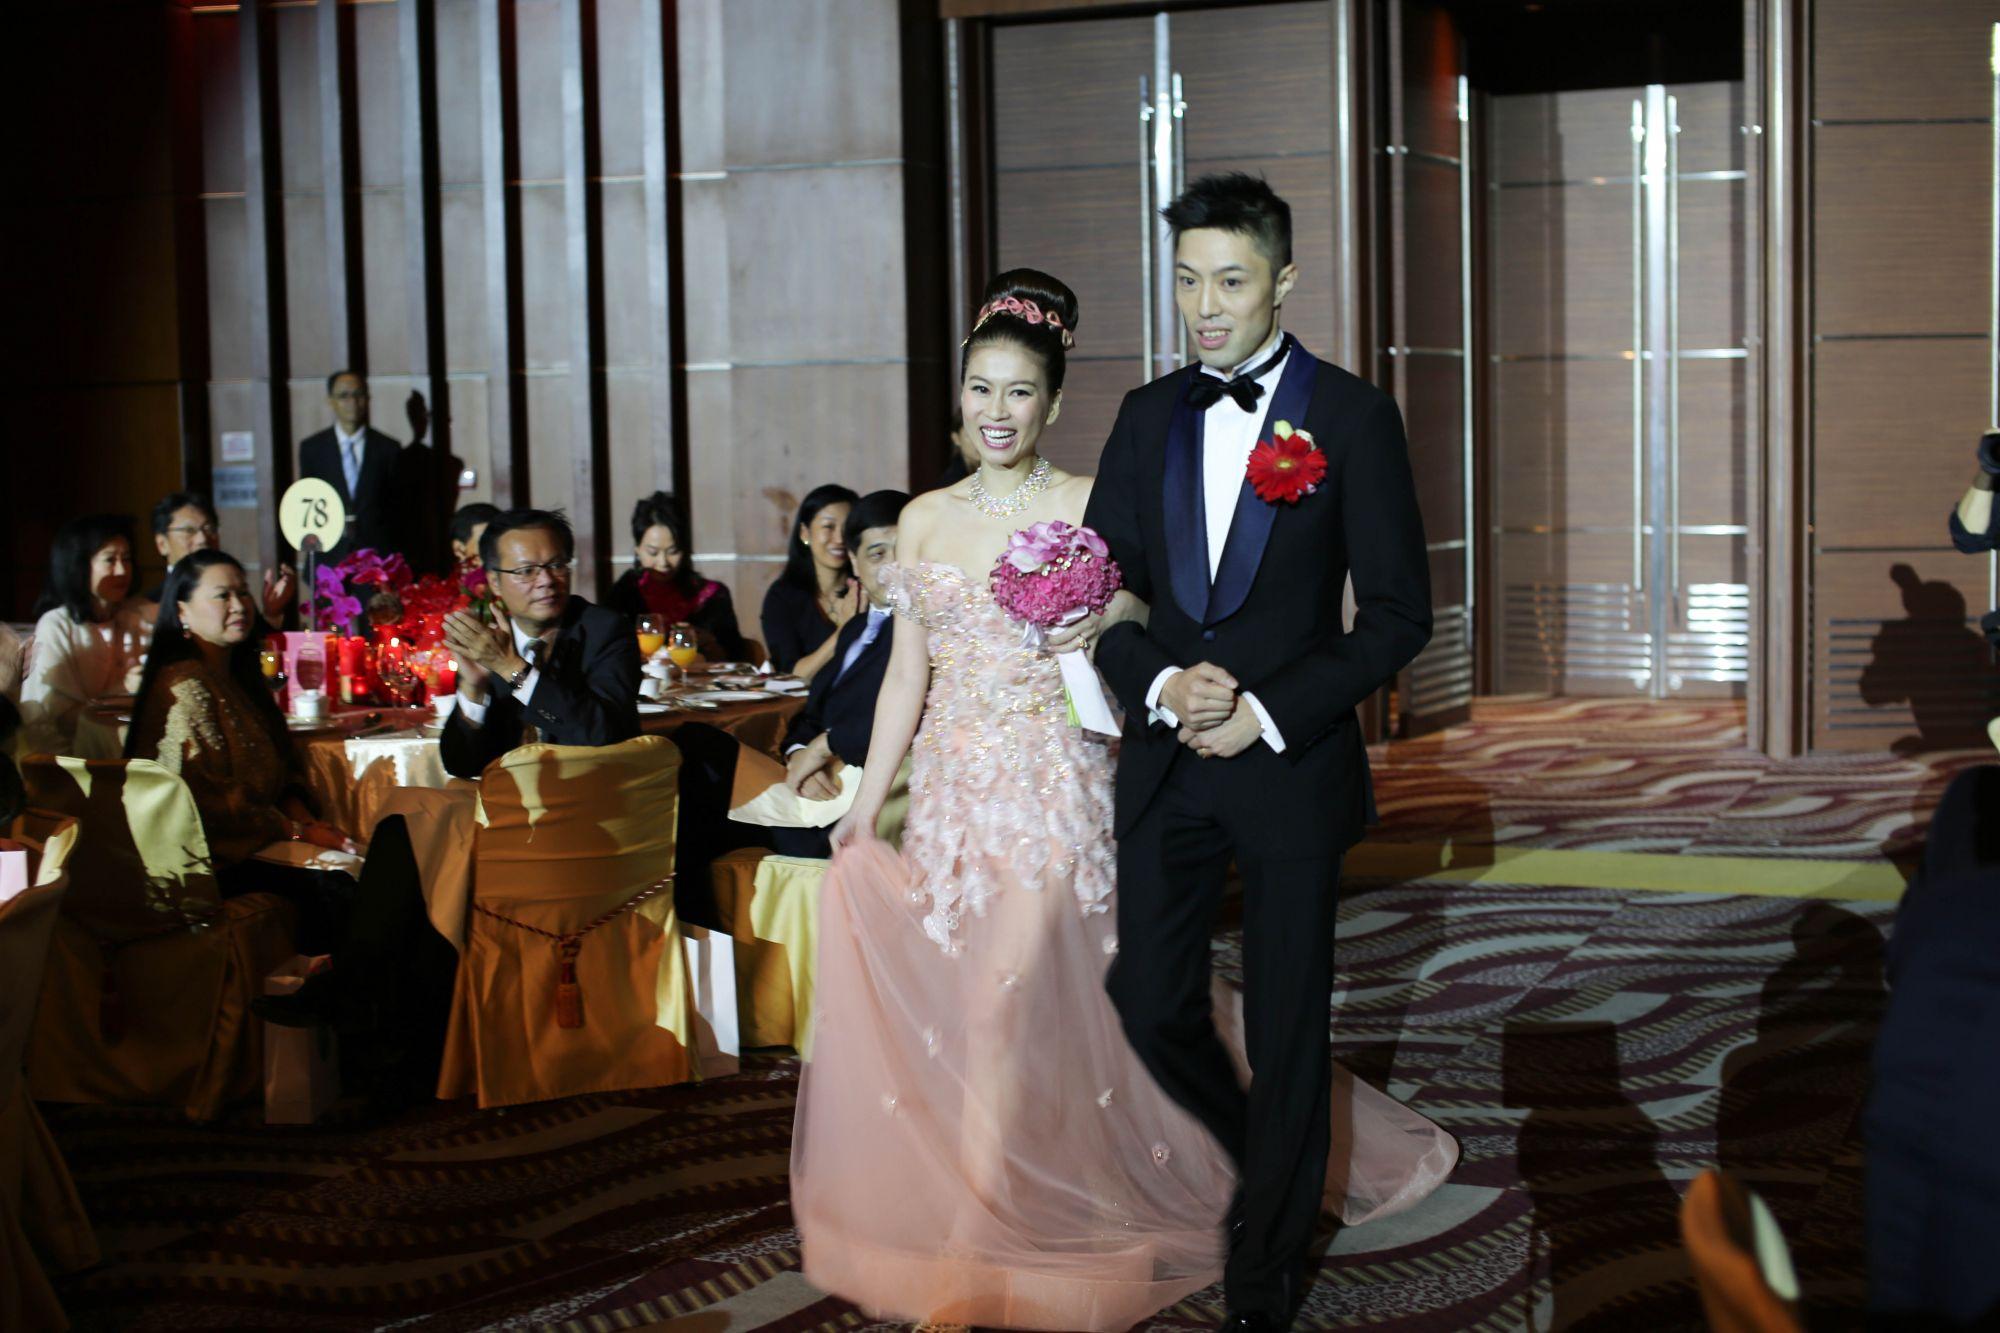 Sandee Lam and Ryan Sun